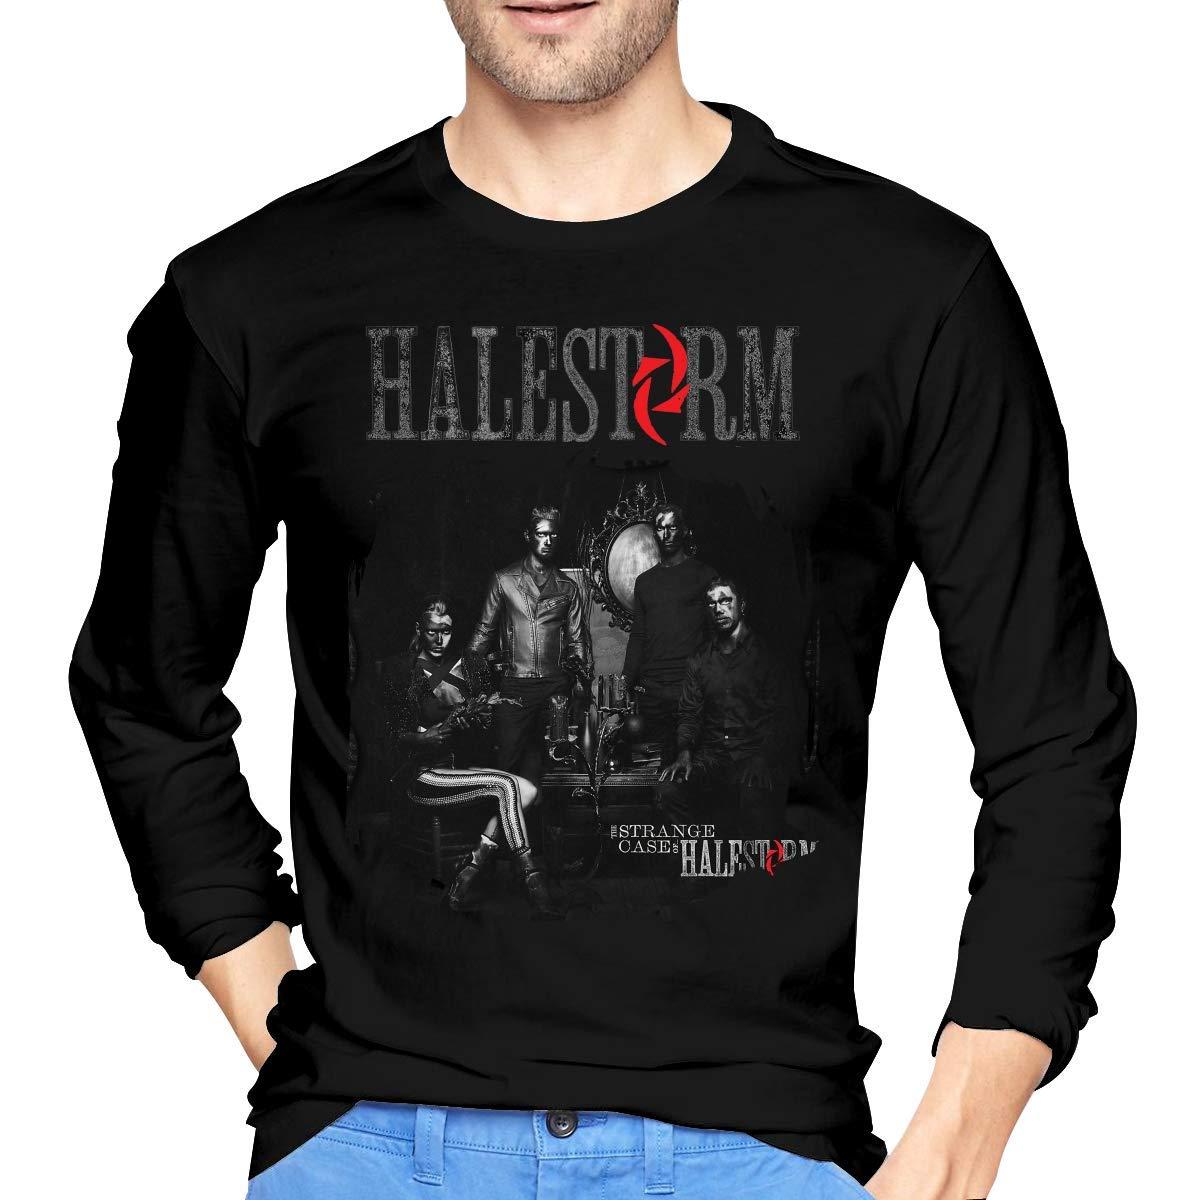 Fssatung S Halestorm The Strange Case Of Tee Black Shirts